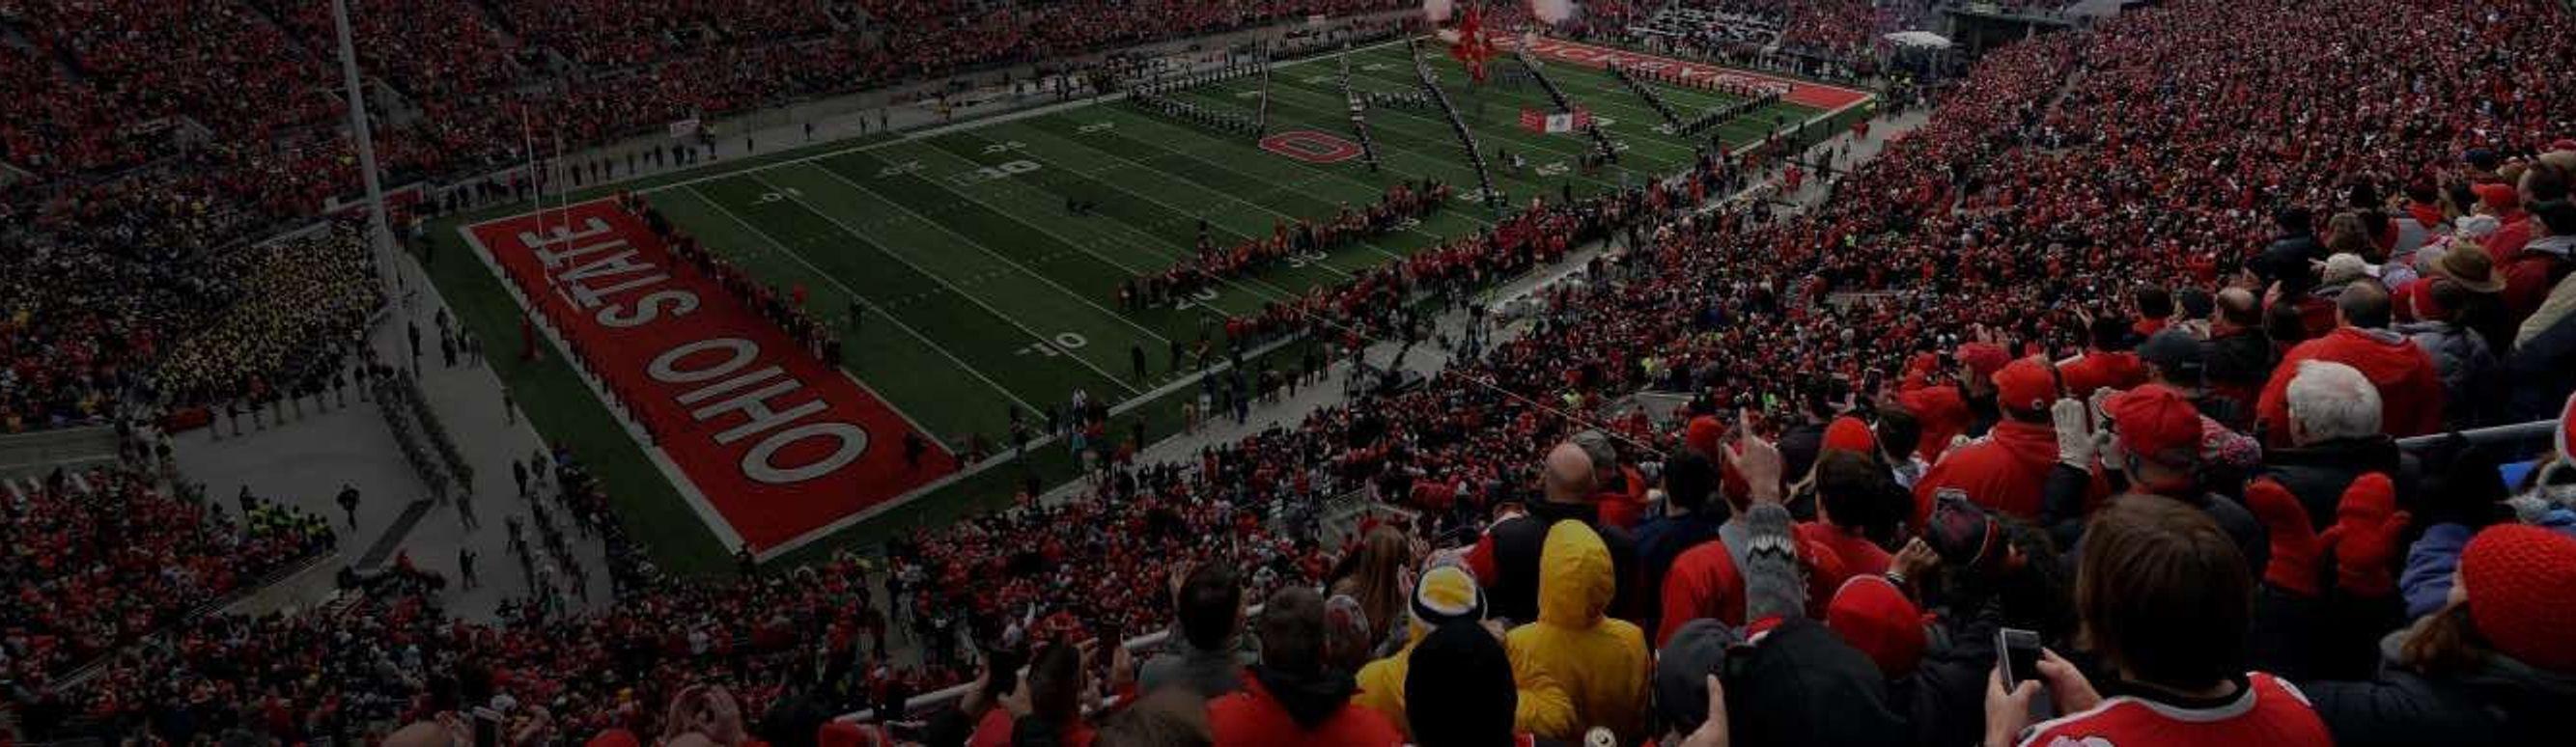 Ohio Stadium packed on game day